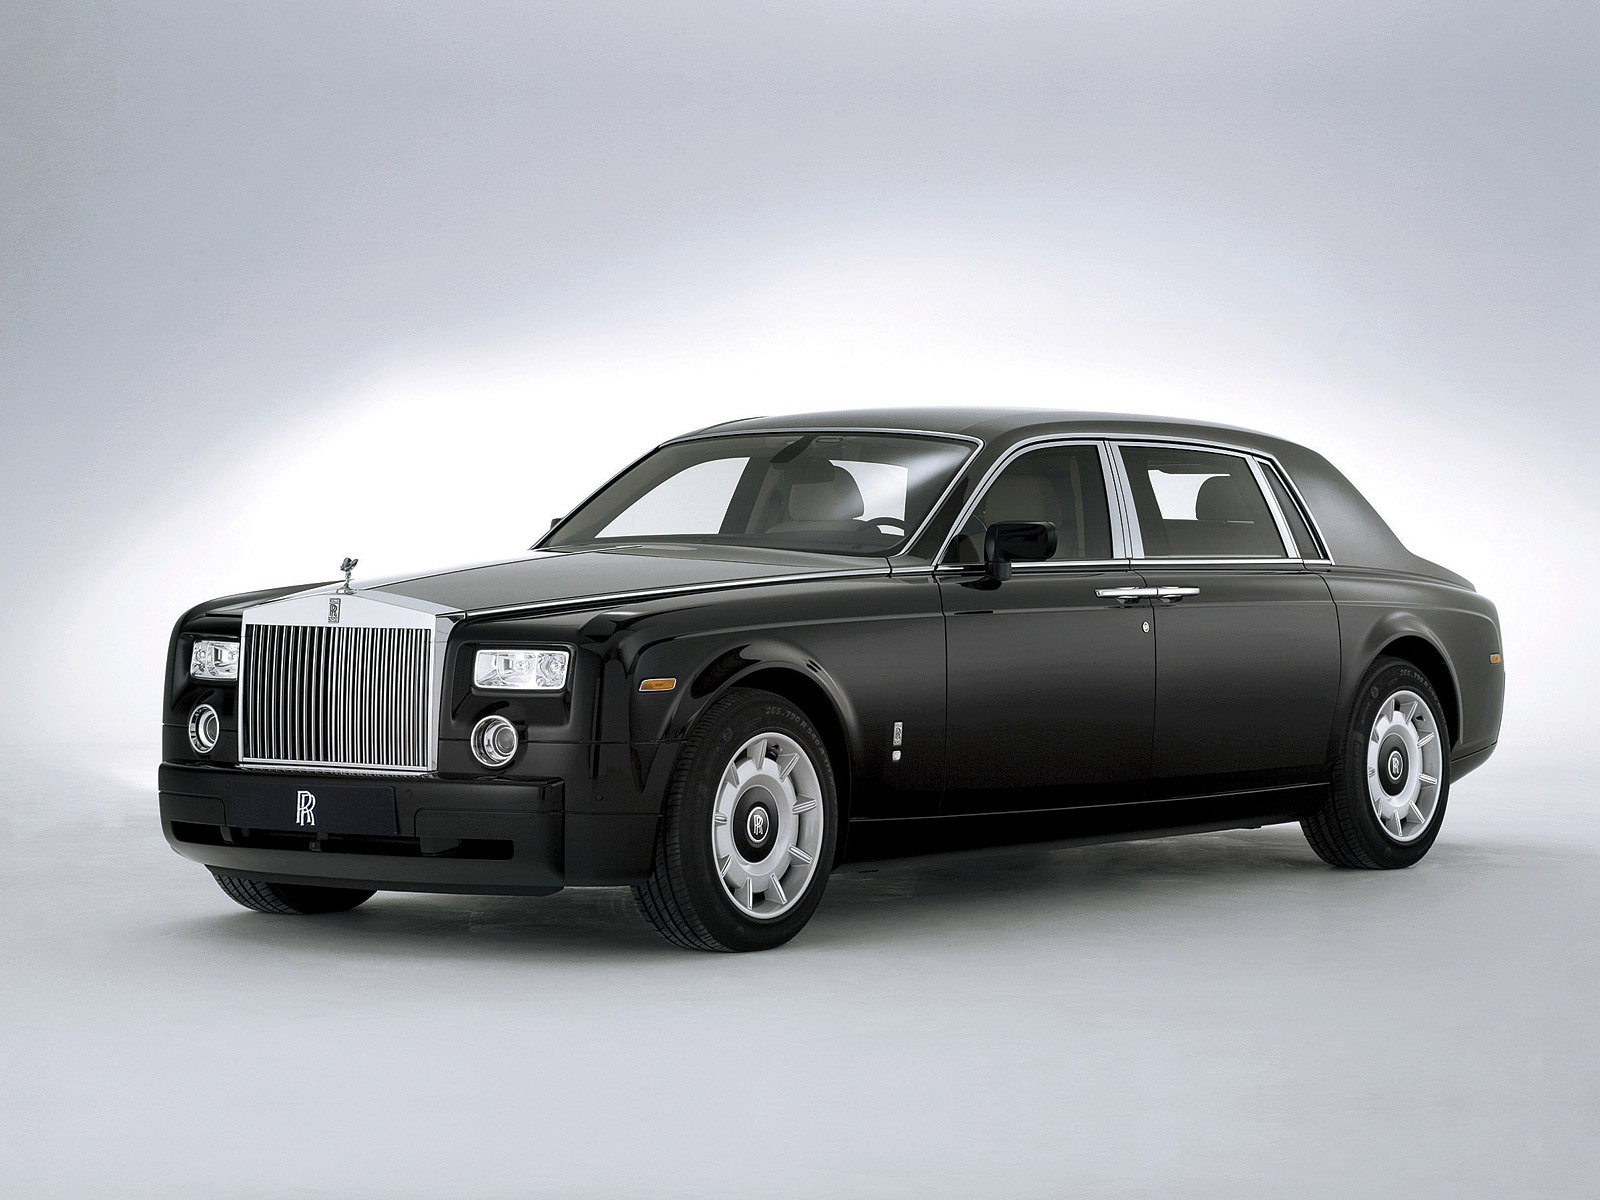 wedding car hire rolls royce phantom. Black Bedroom Furniture Sets. Home Design Ideas